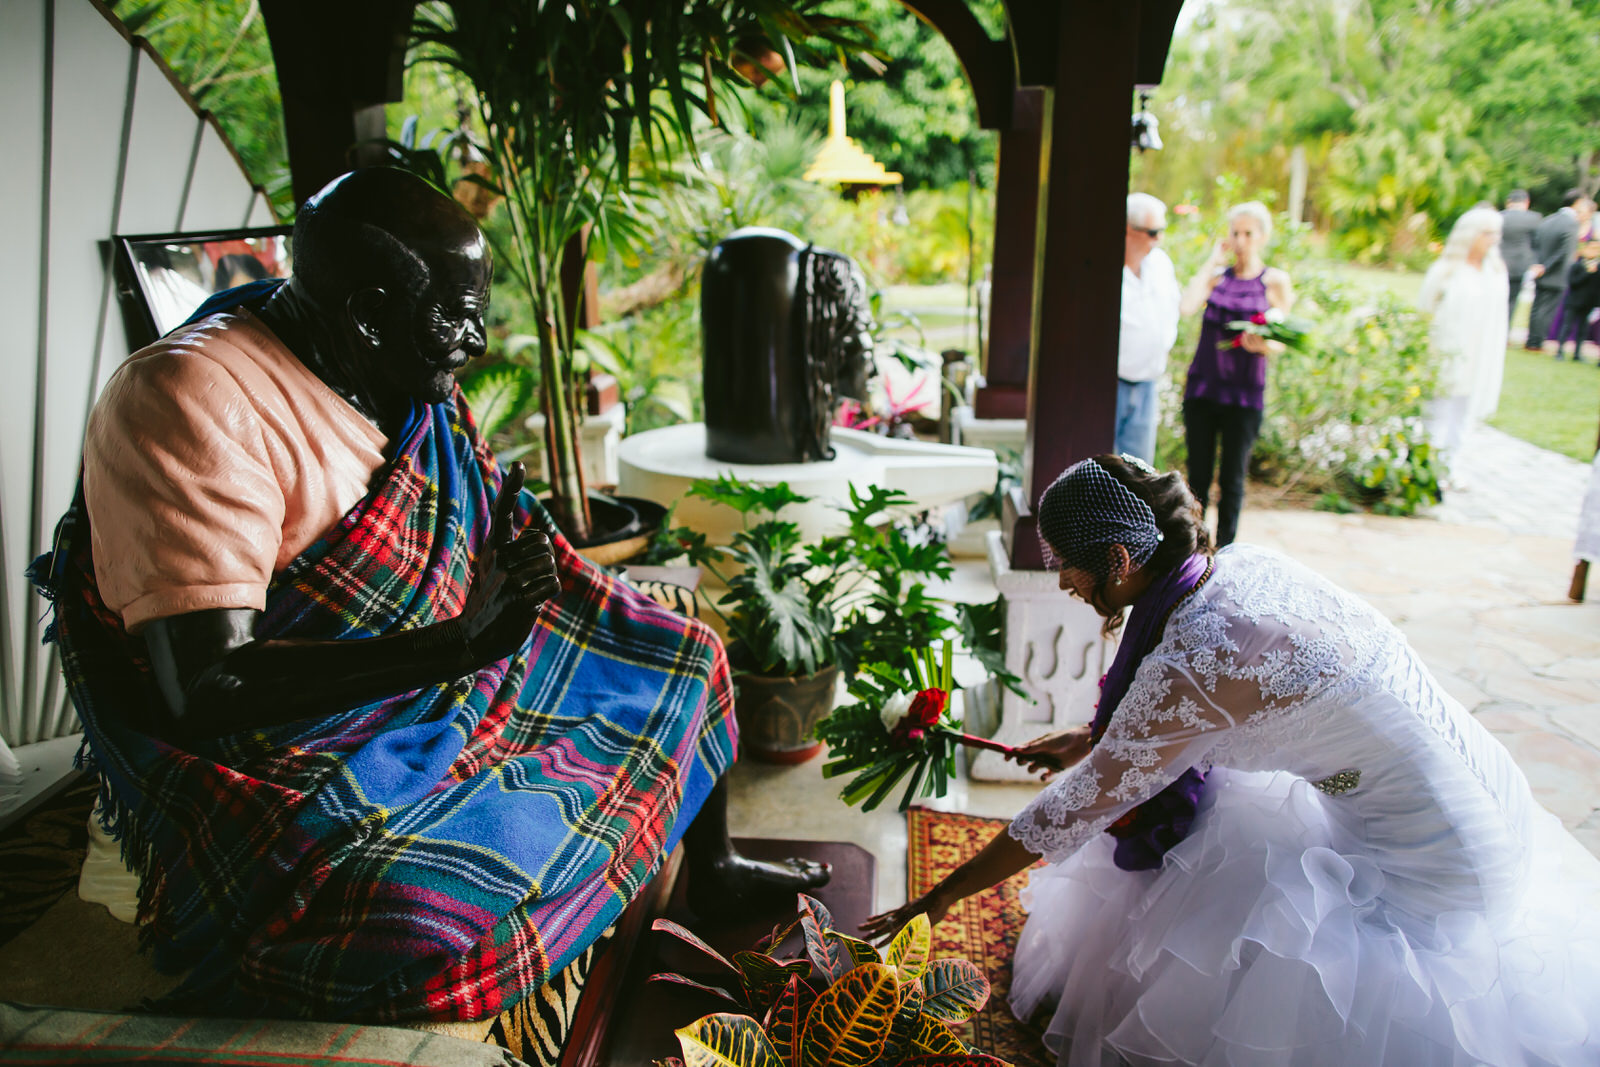 kashi-ashram-wedding-ceremony-spiritual-ritual.jpg